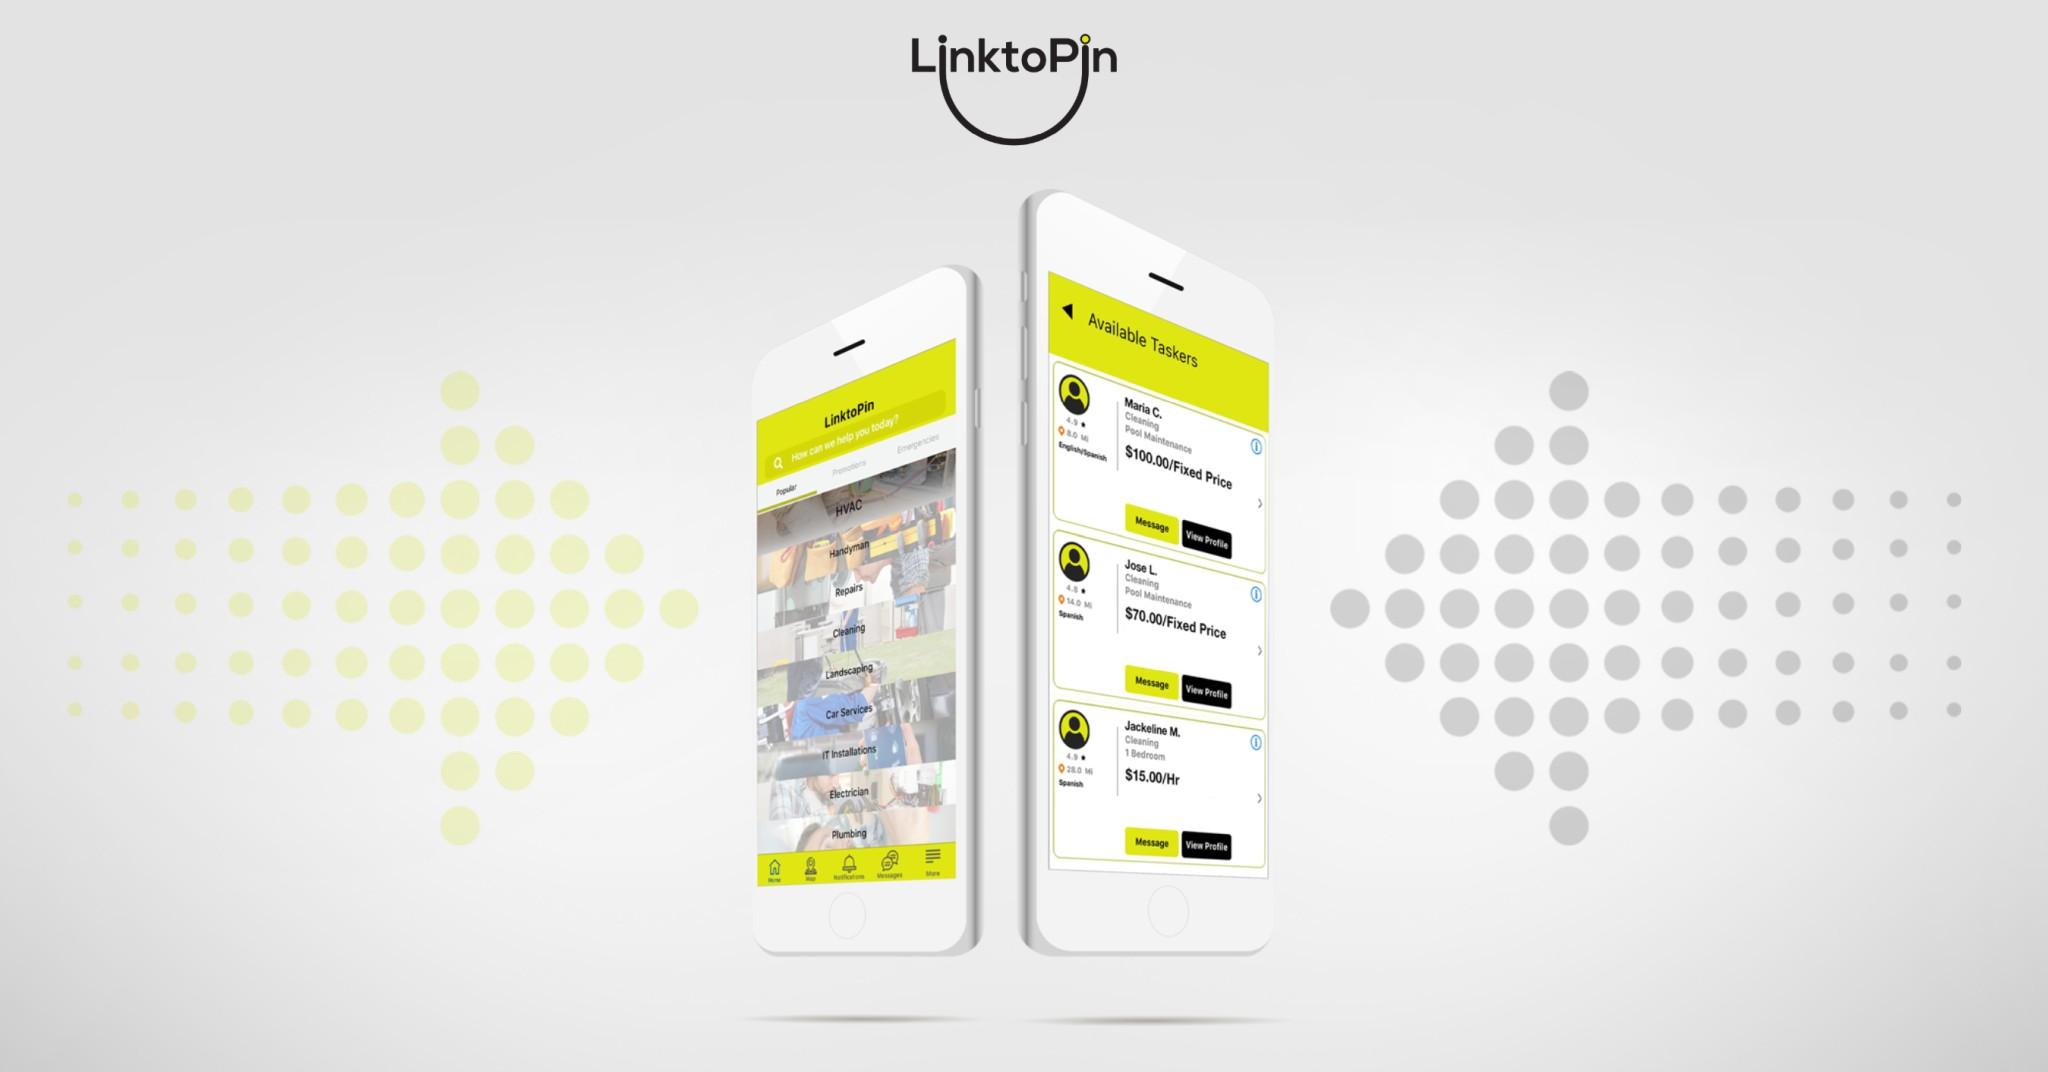 LinkToPin